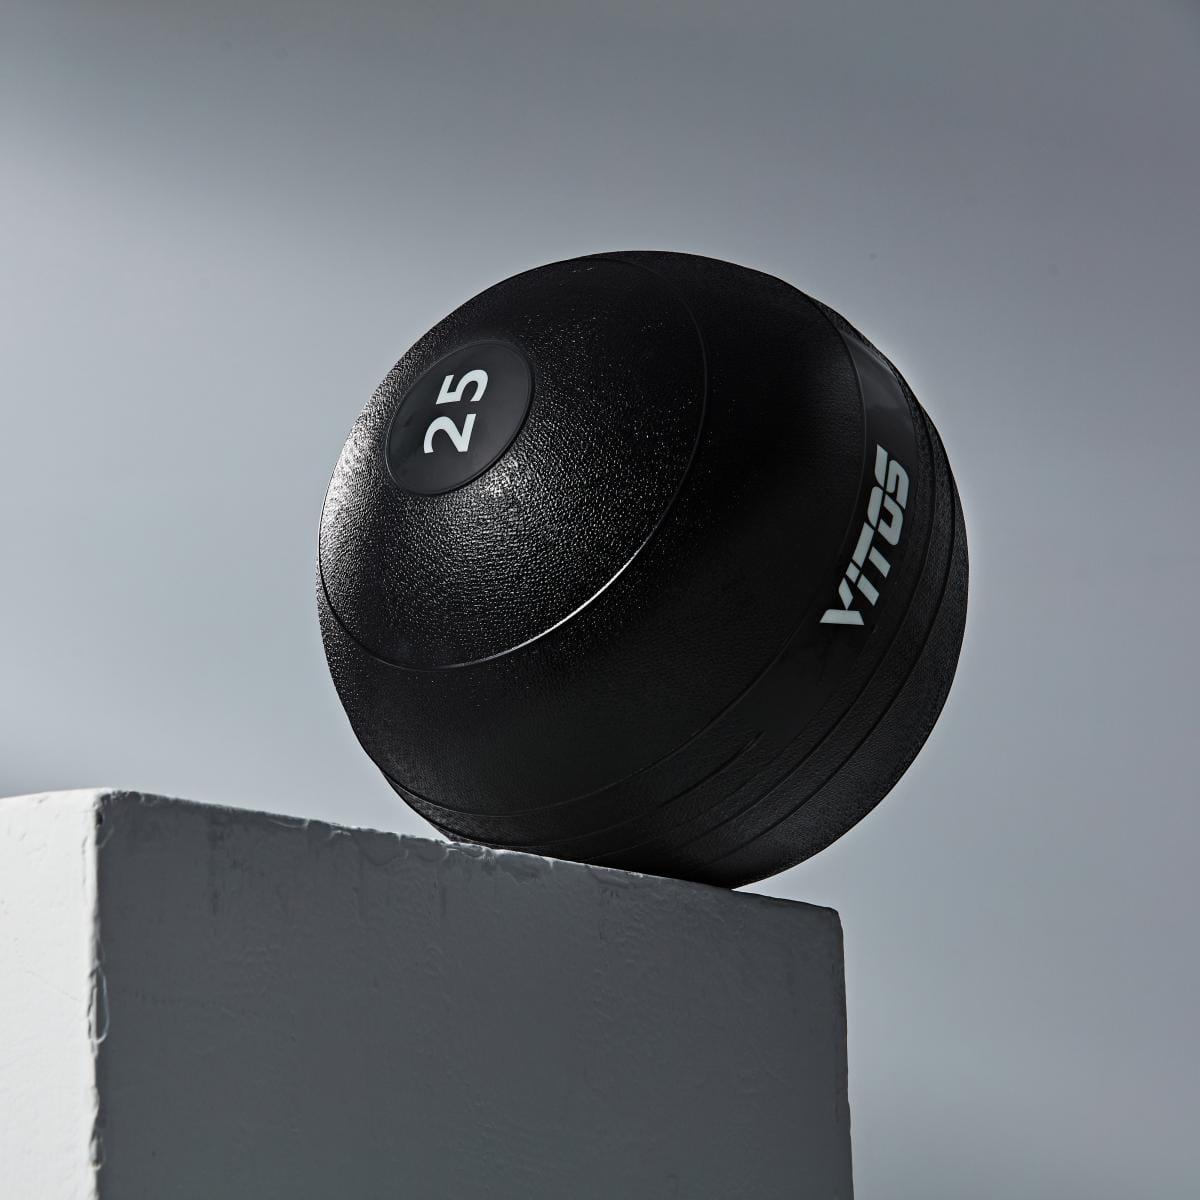 VITOS 重力球 45磅 20公斤 2